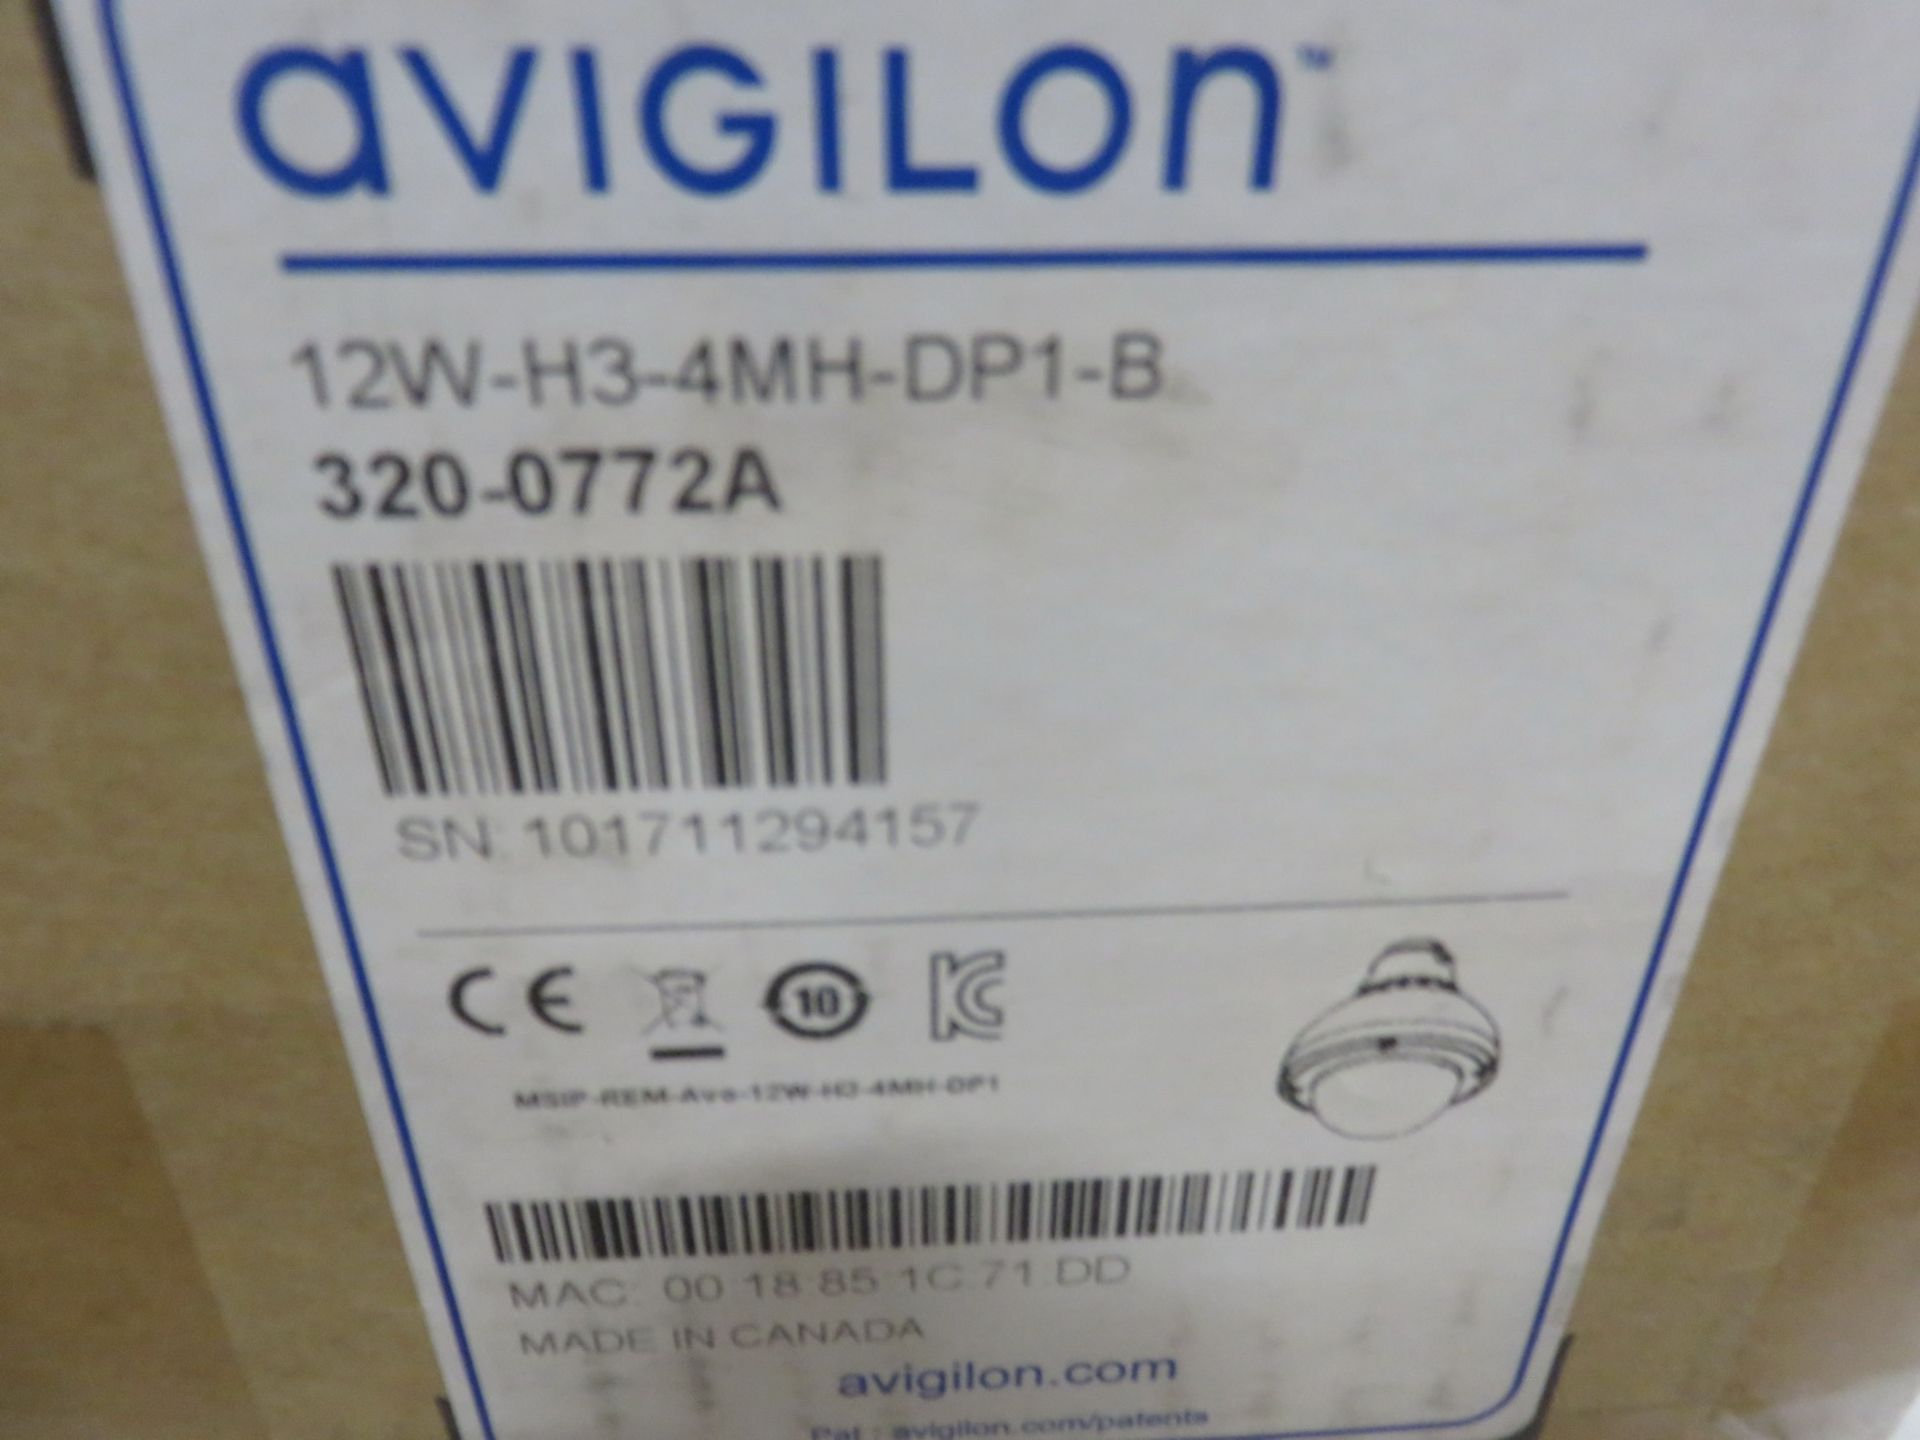 Lot 22 - NEW - AVIGILON MODEL (12W-H3-4MH-DP1-B) DOME SECURITY CAMERA